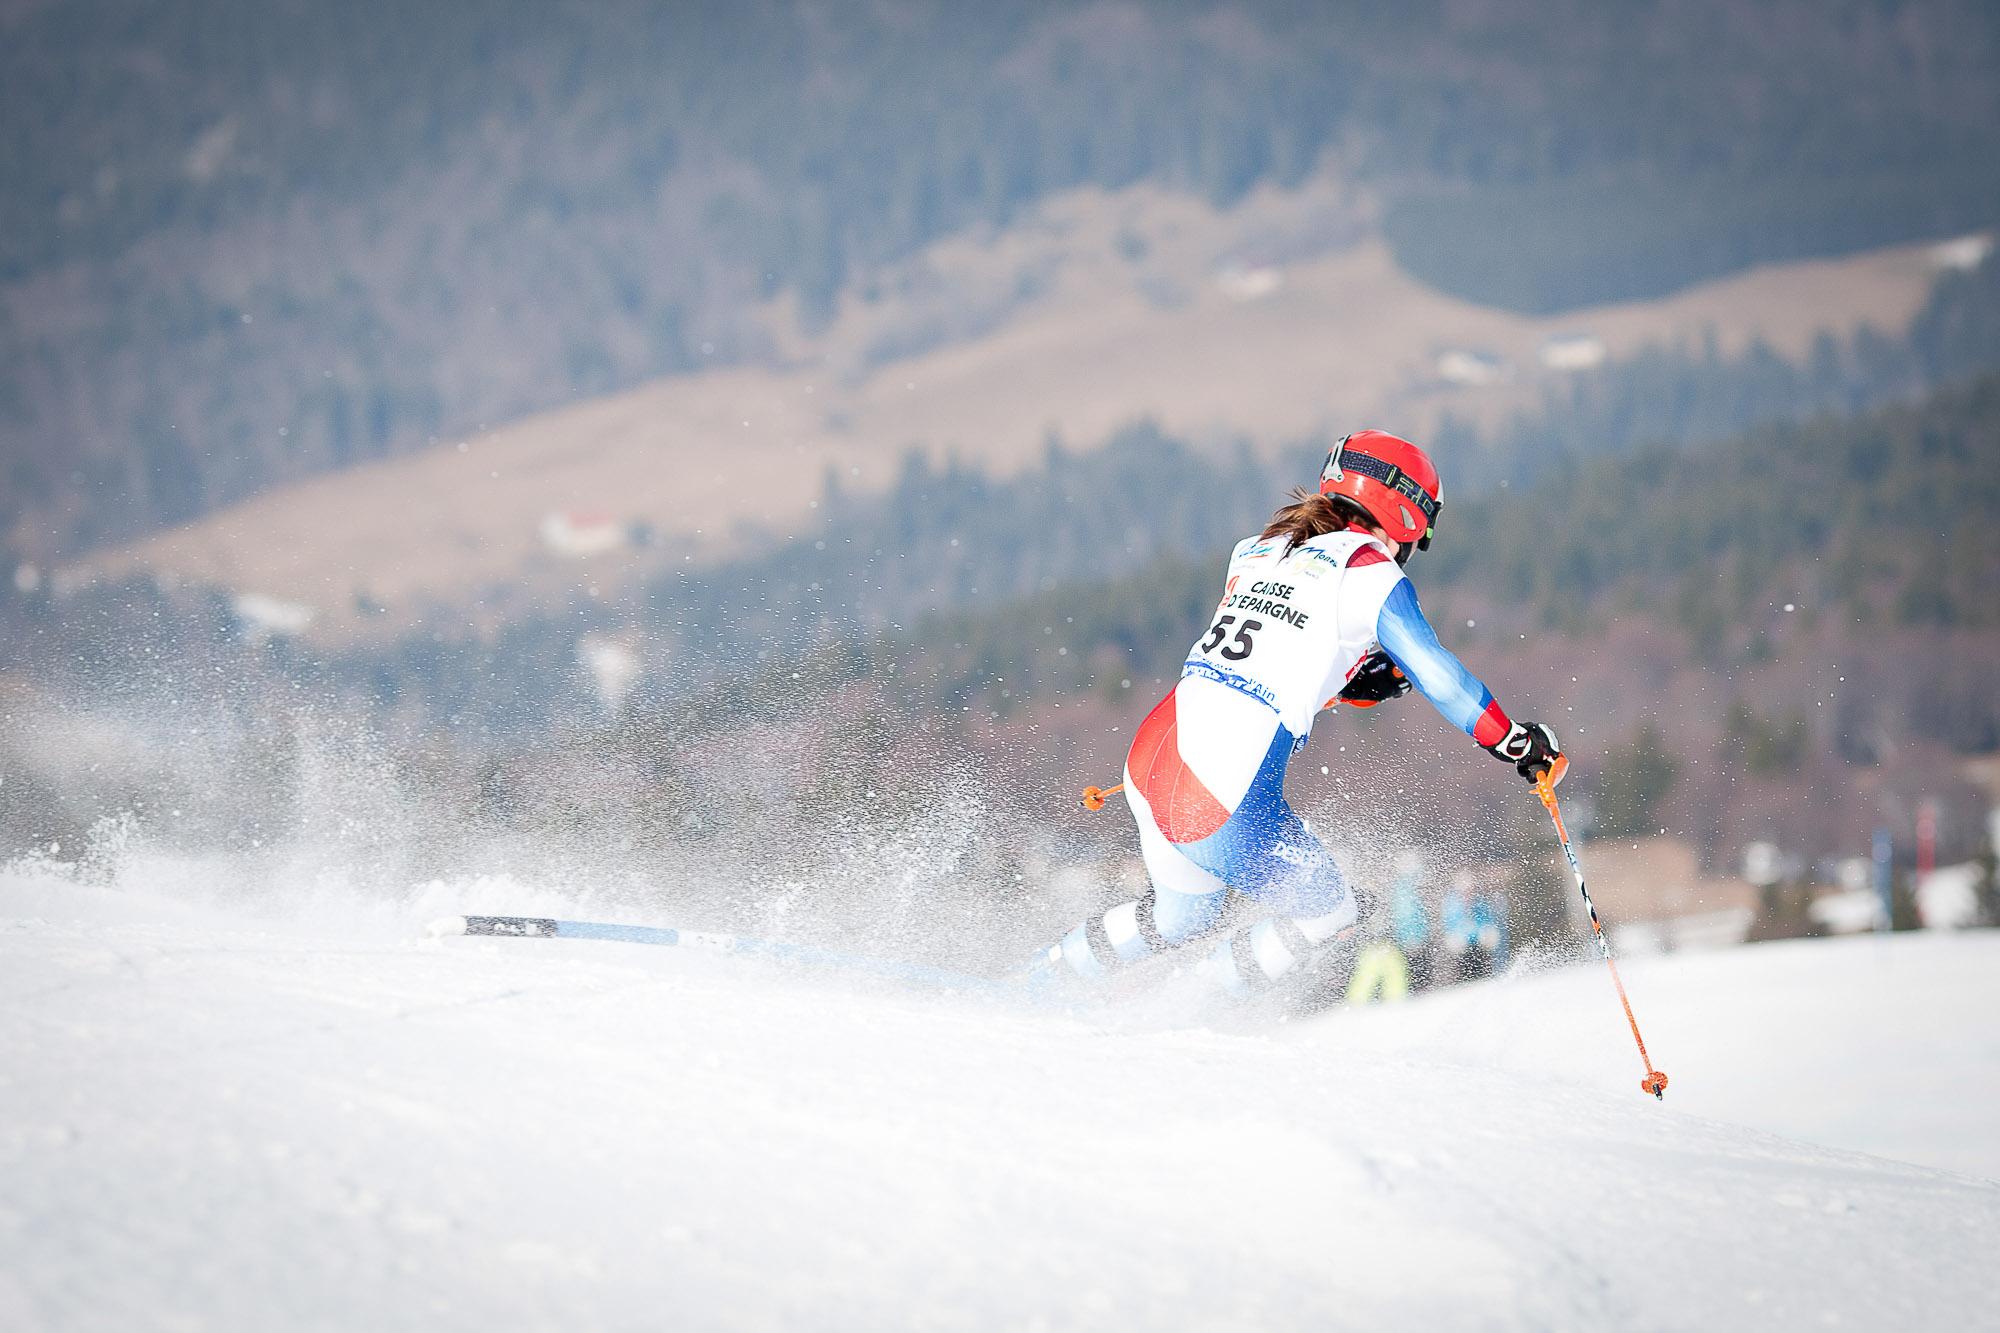 Coupe_Europe_ski_dames-318.jpg